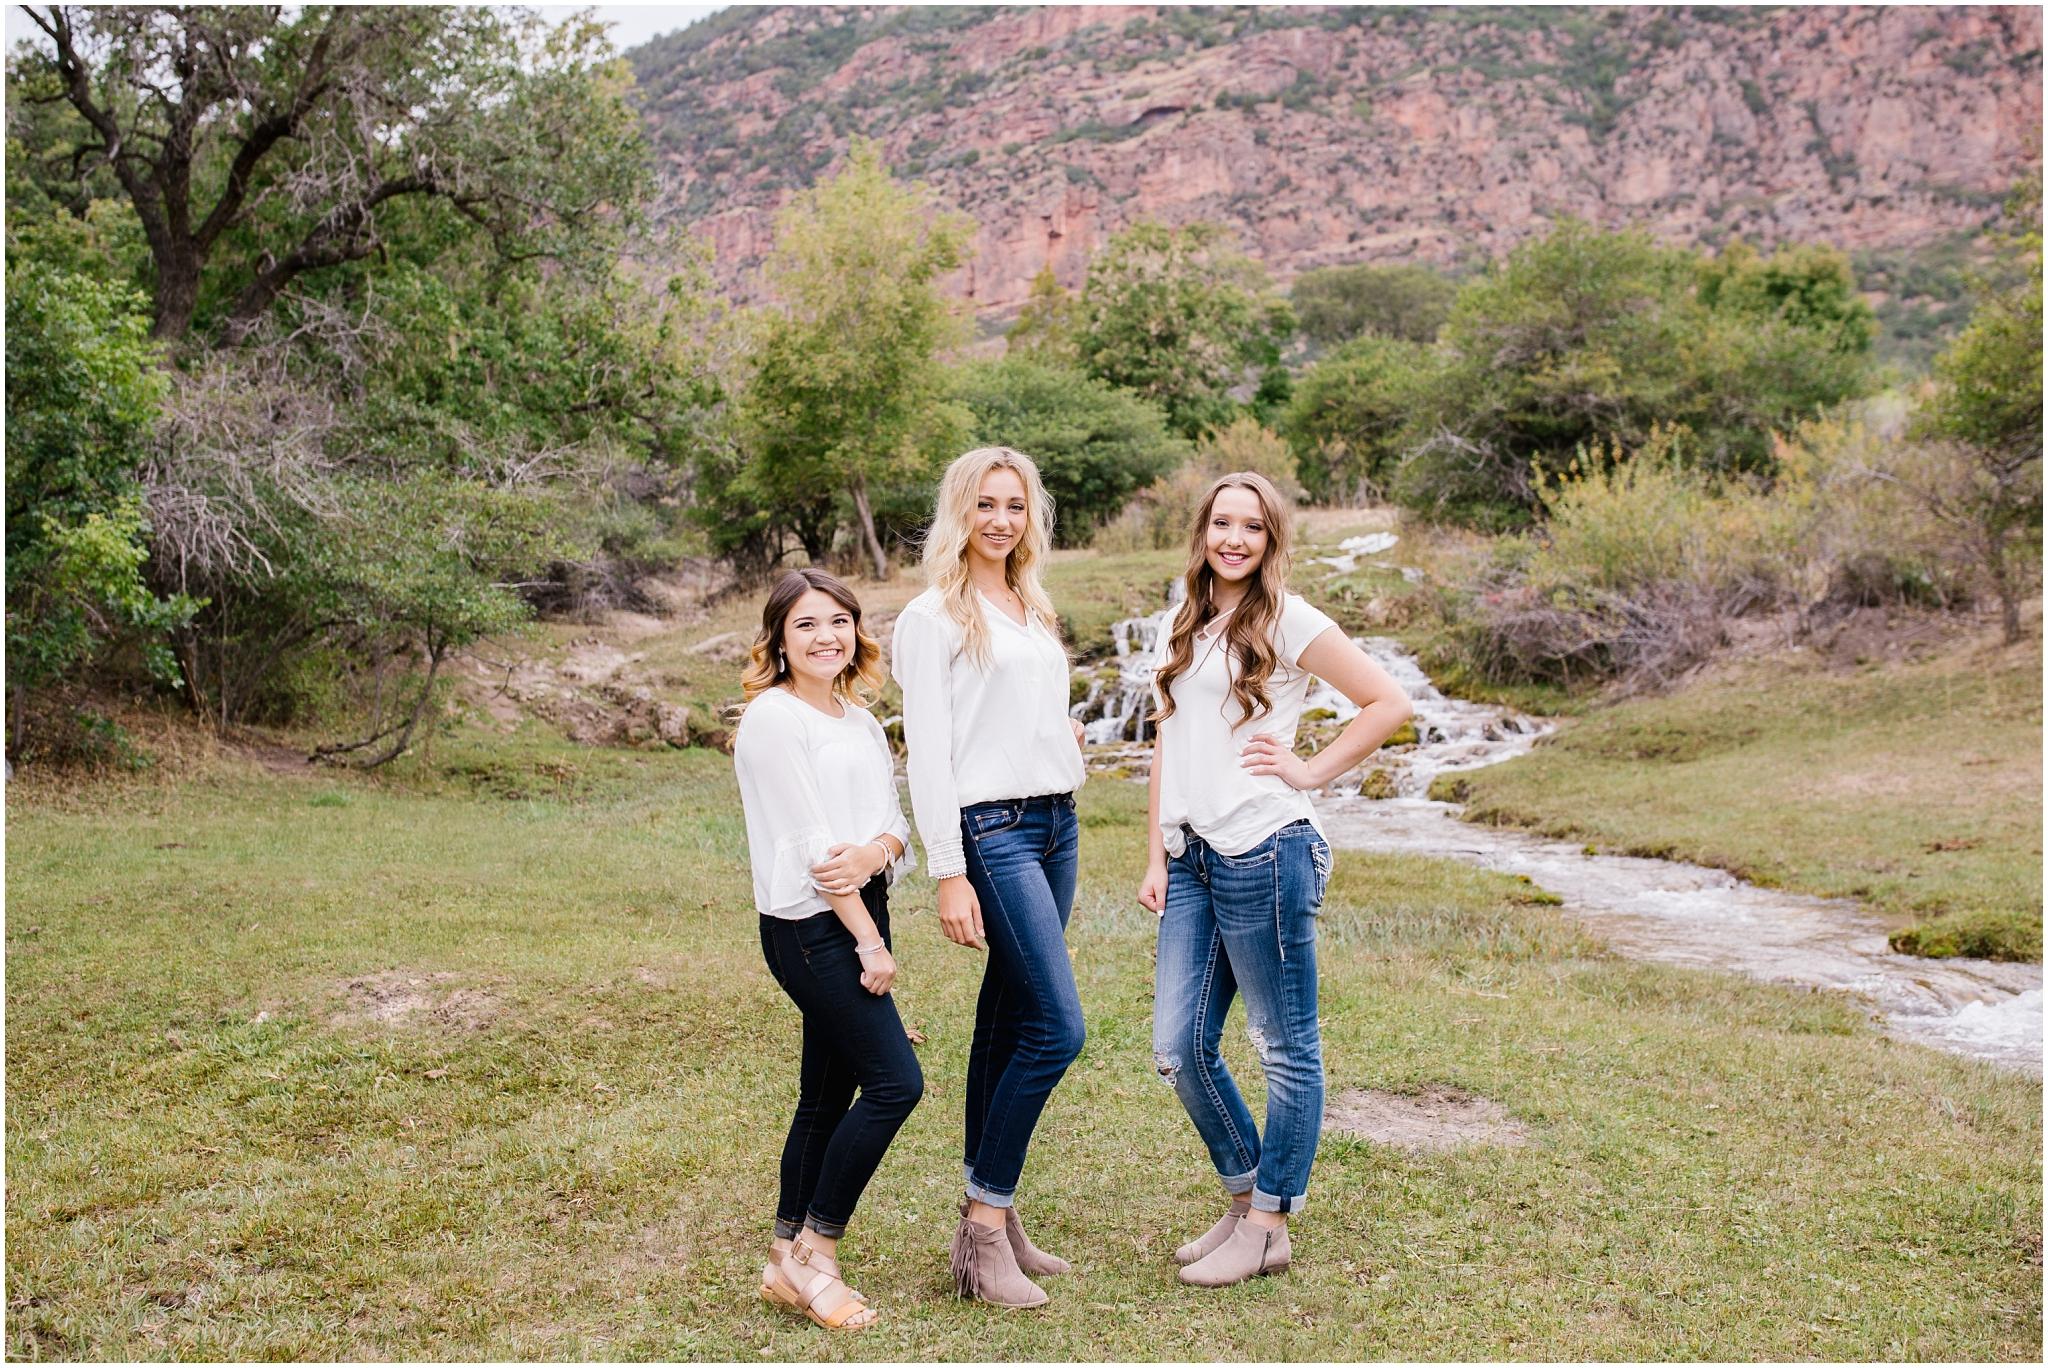 GVHSDRILL-17_Lizzie-B-Imagery-Utah-Family-Photographer-Central-Utah-Park-City-Salt-Lake-City-Drill-Team-Photography-Dance.jpg